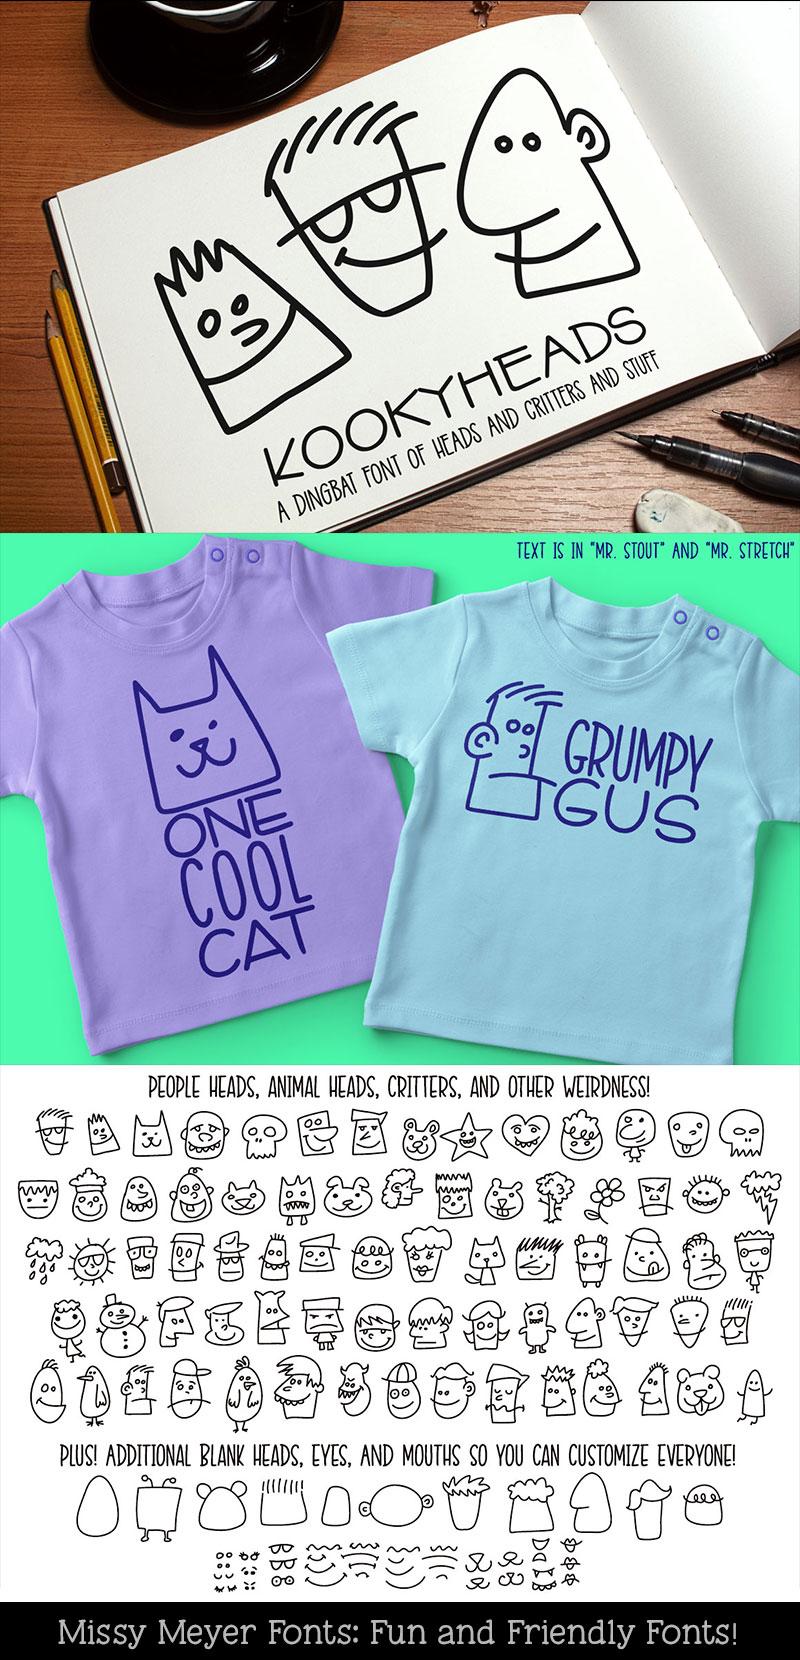 Kookyheads - a dingbat doodle font! example image 7